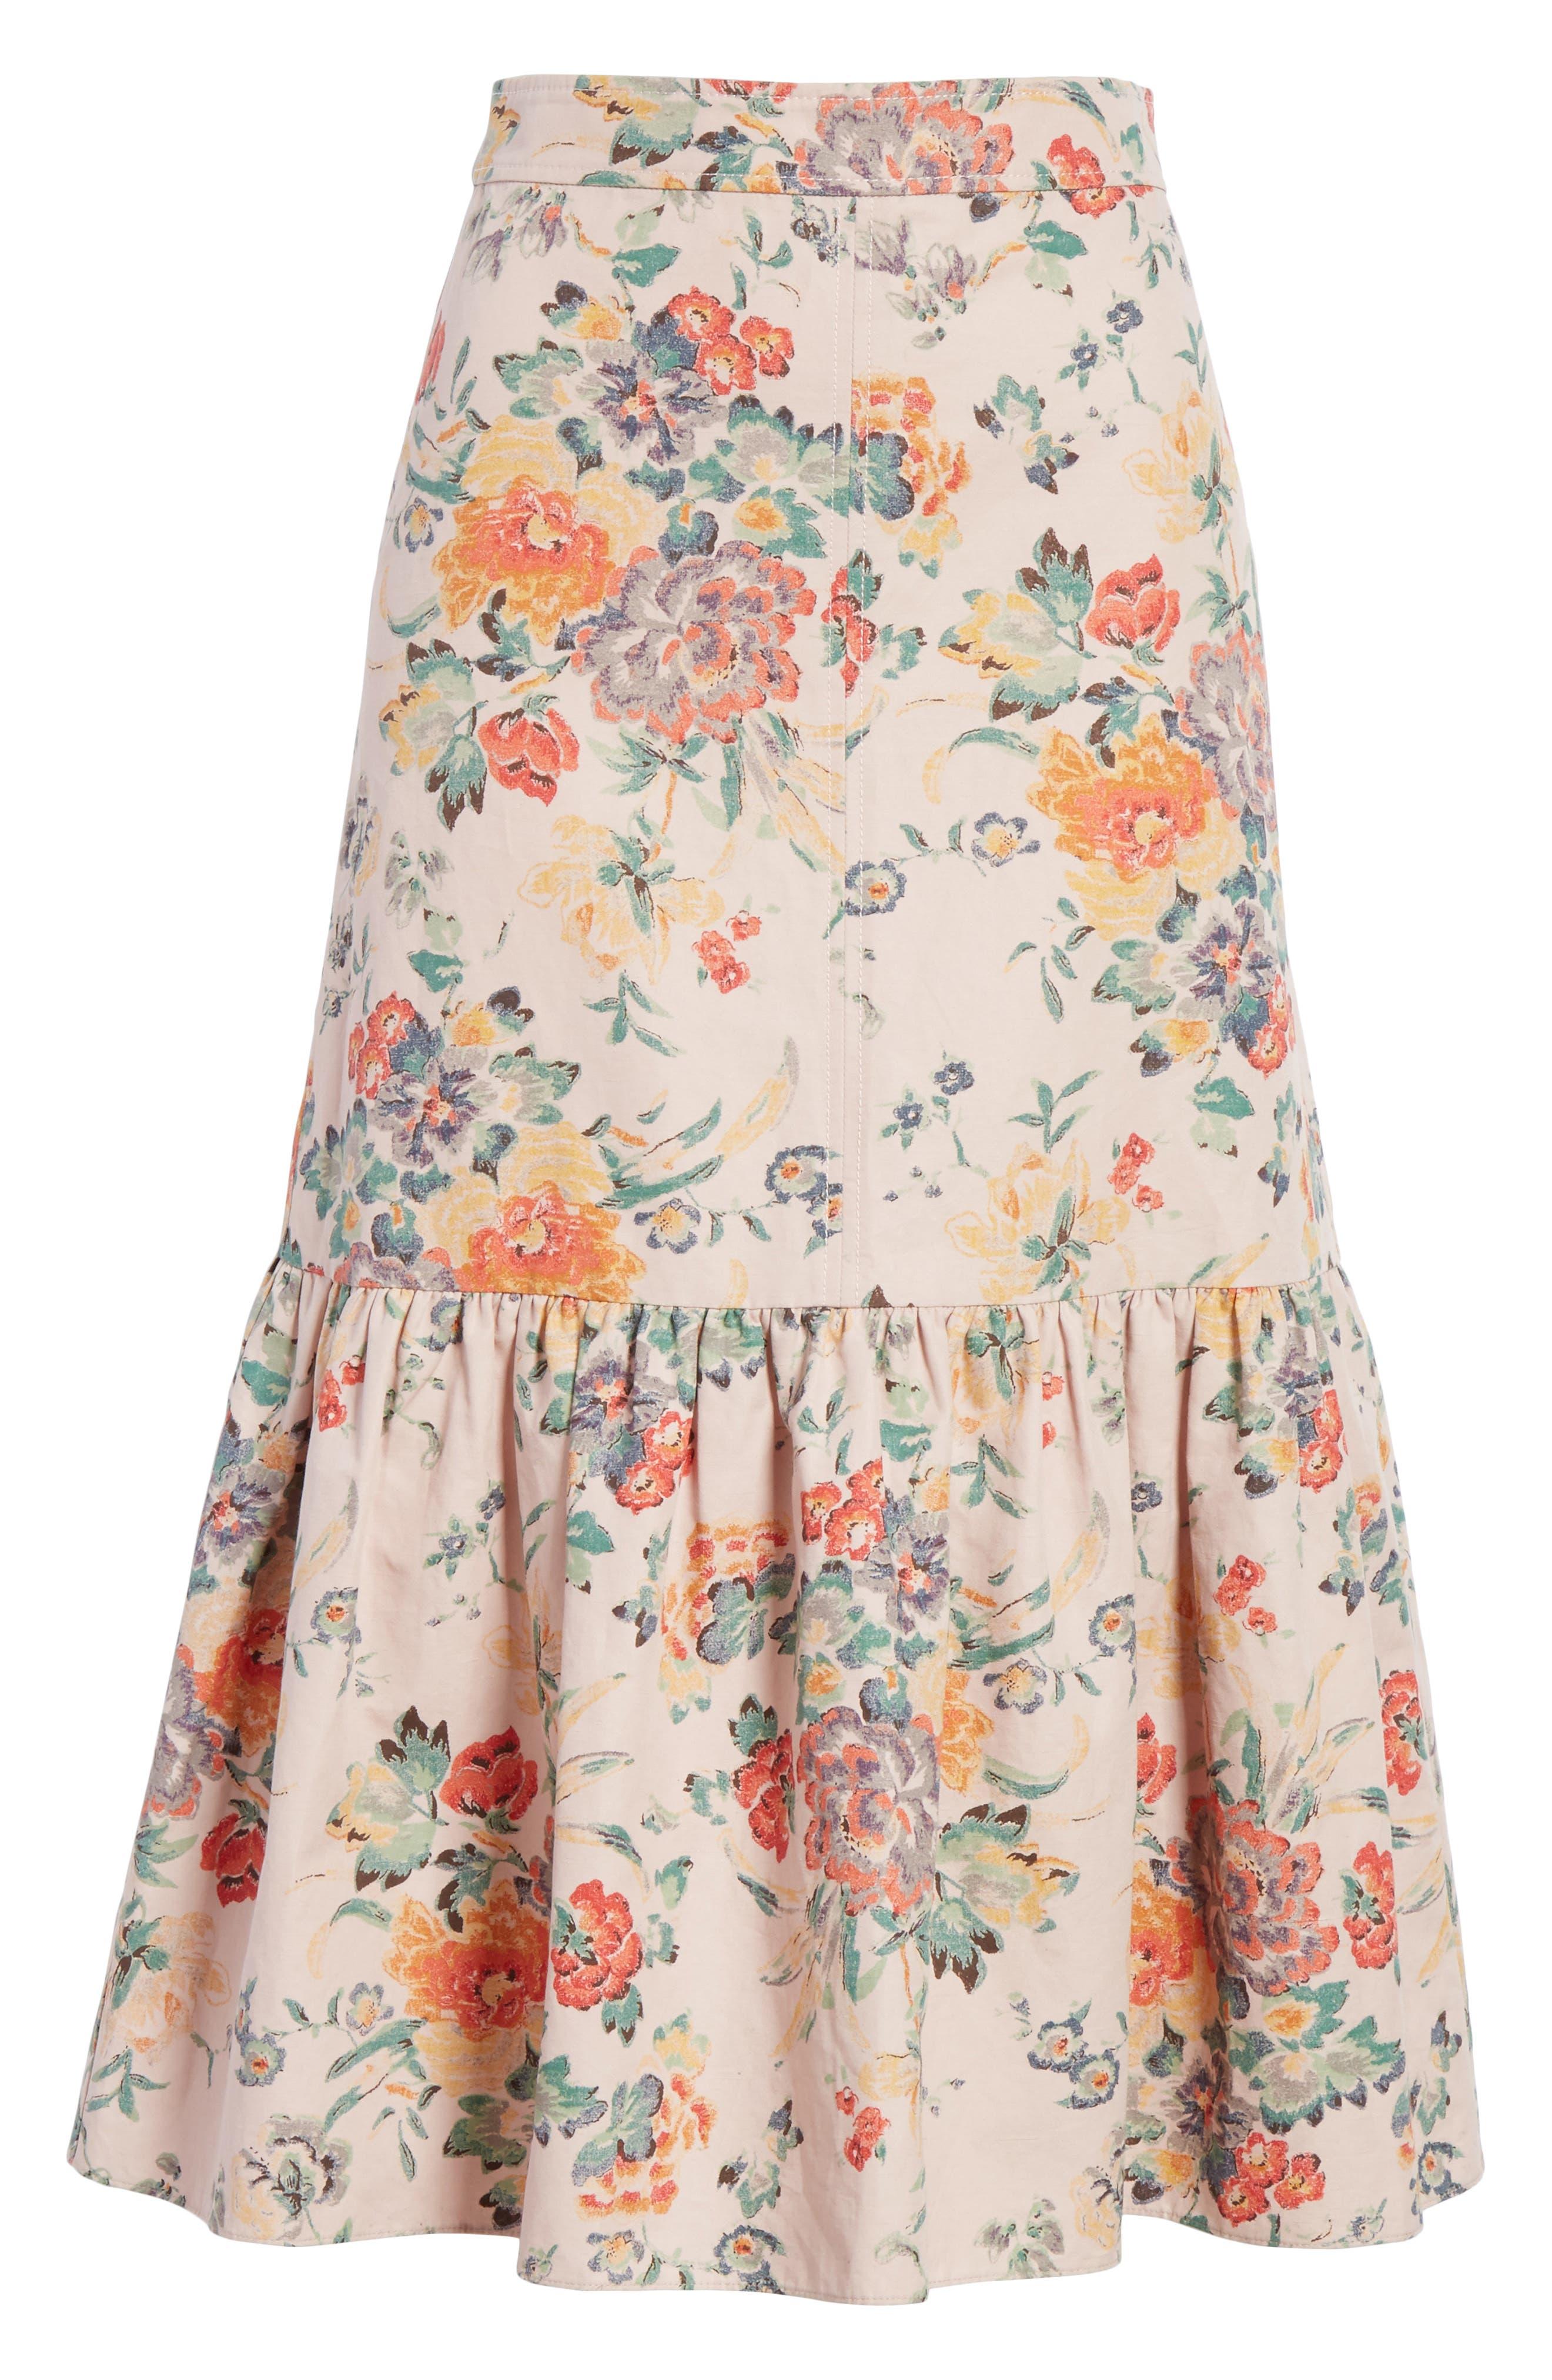 Marlena Ruffled Floral Skirt,                             Alternate thumbnail 6, color,                             Dusty Rose Combo